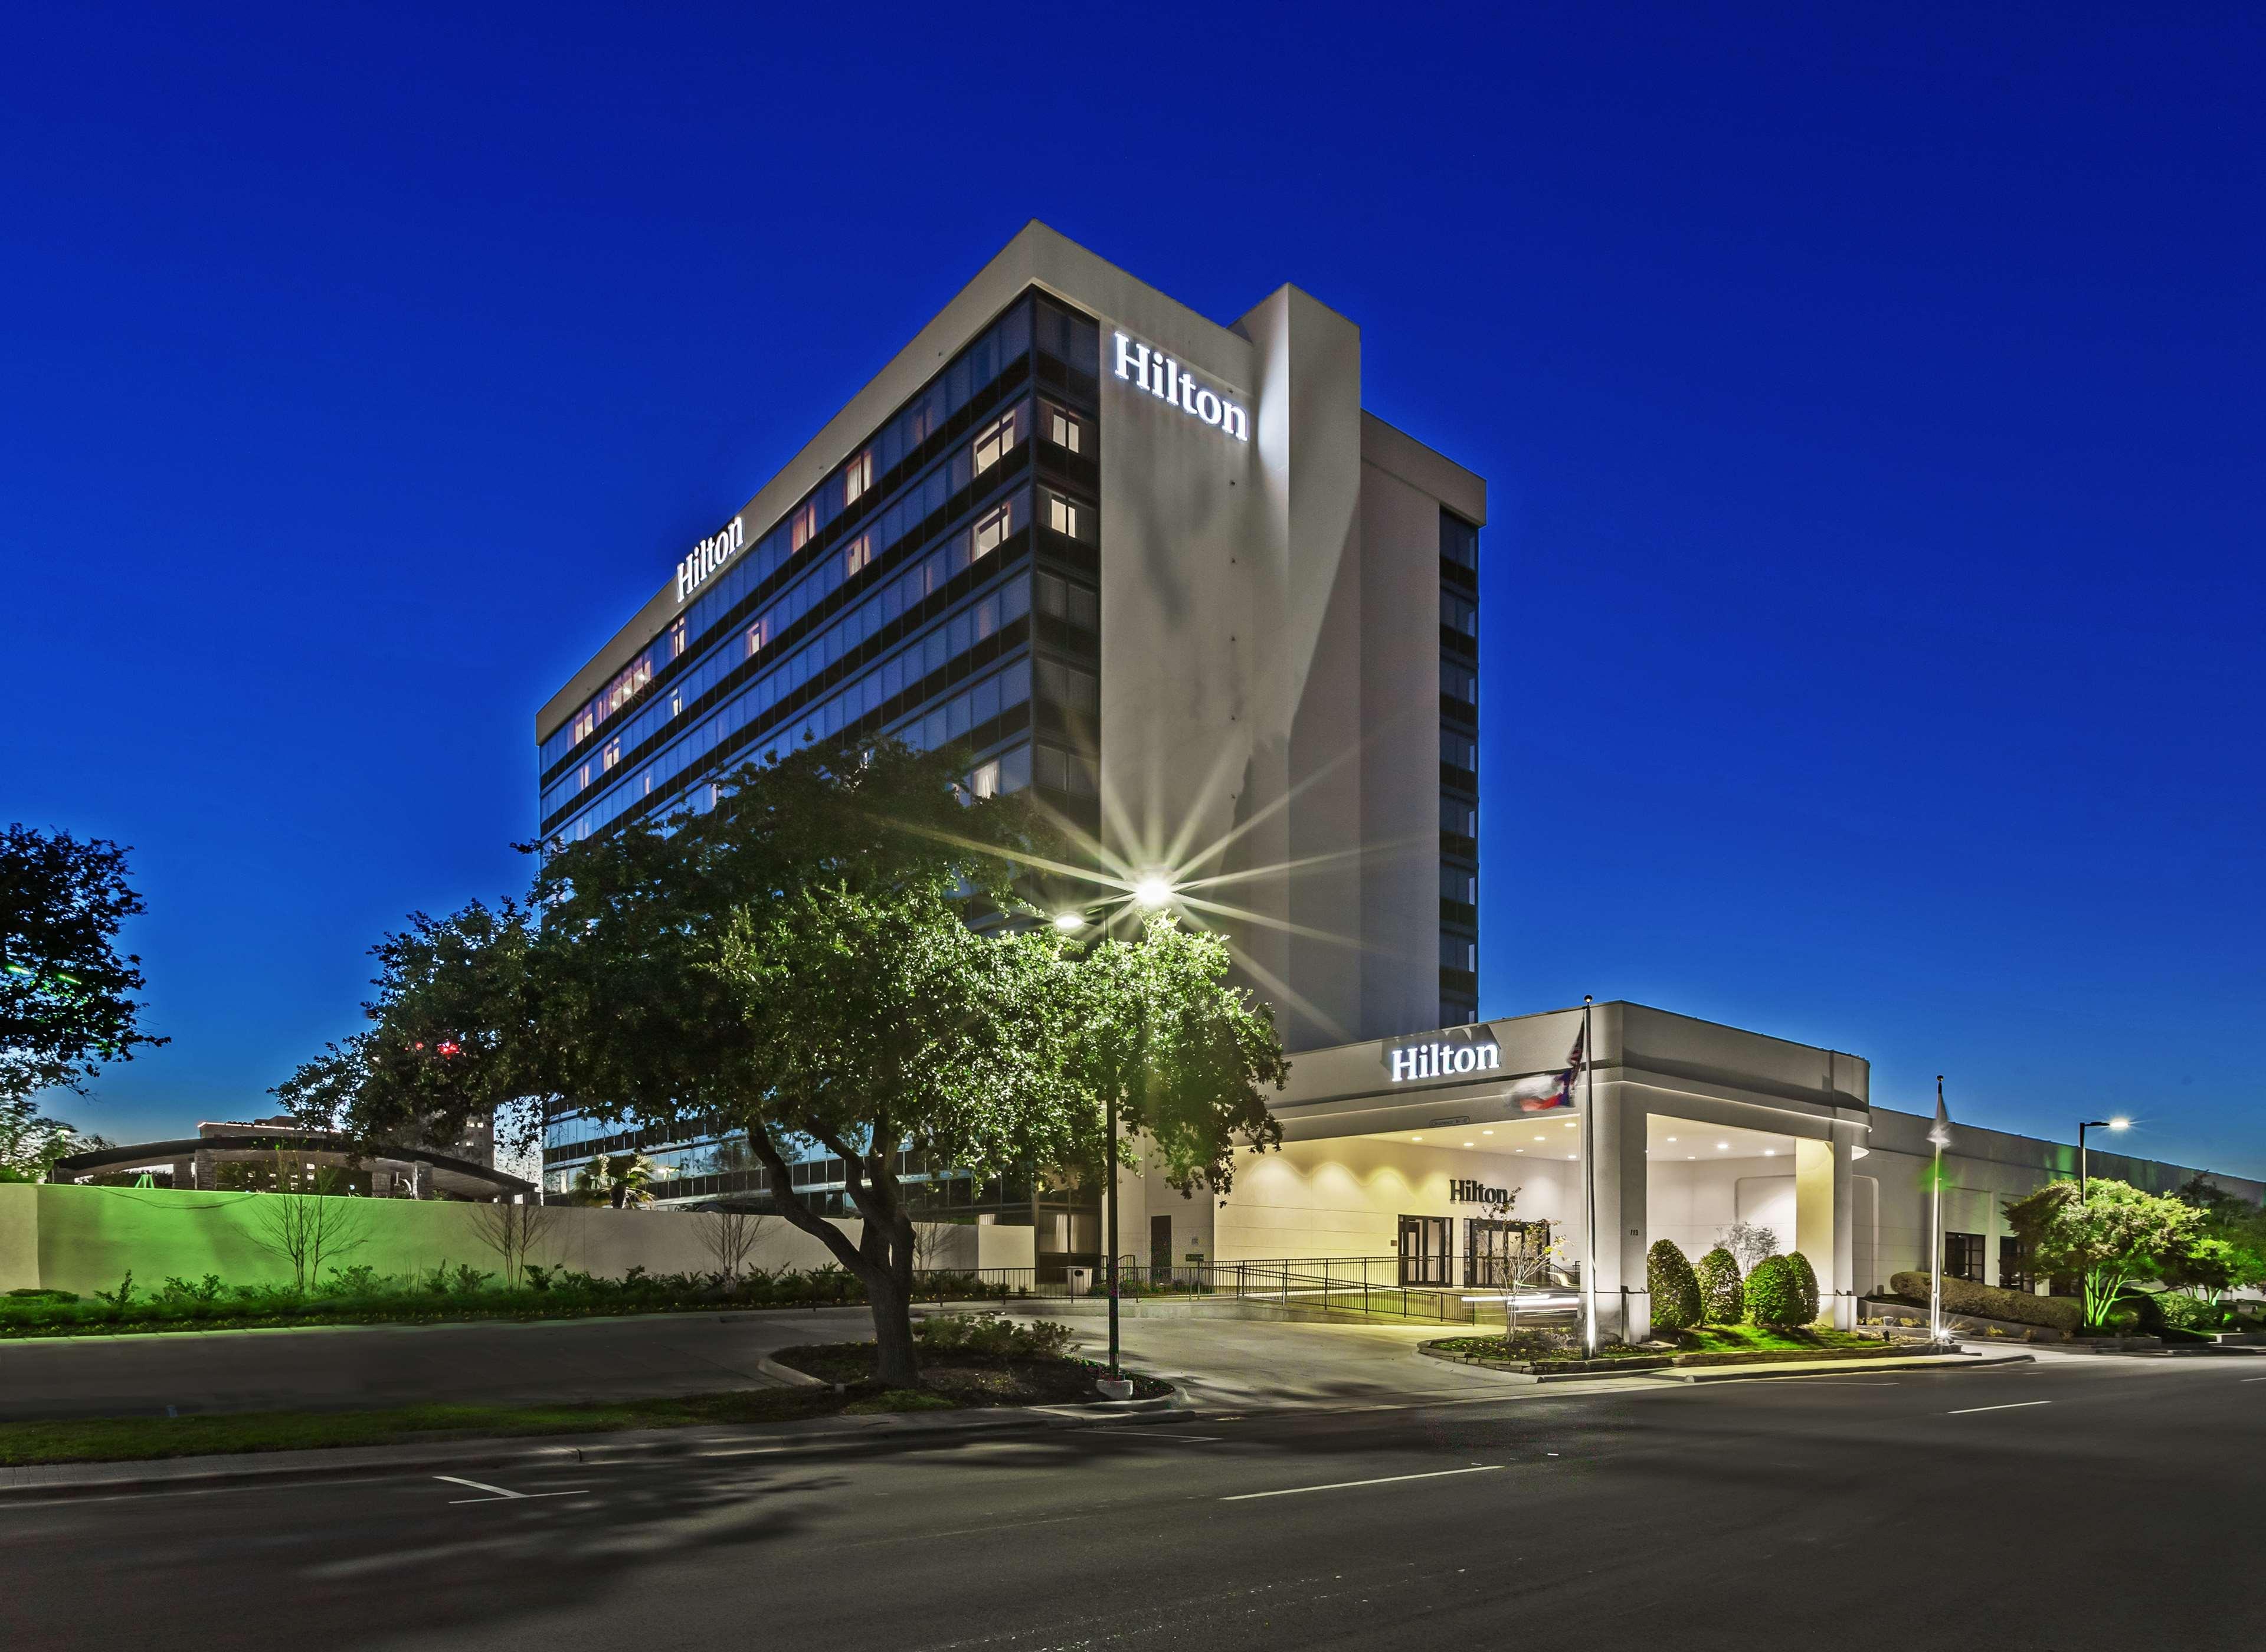 Hilton Waco image 0